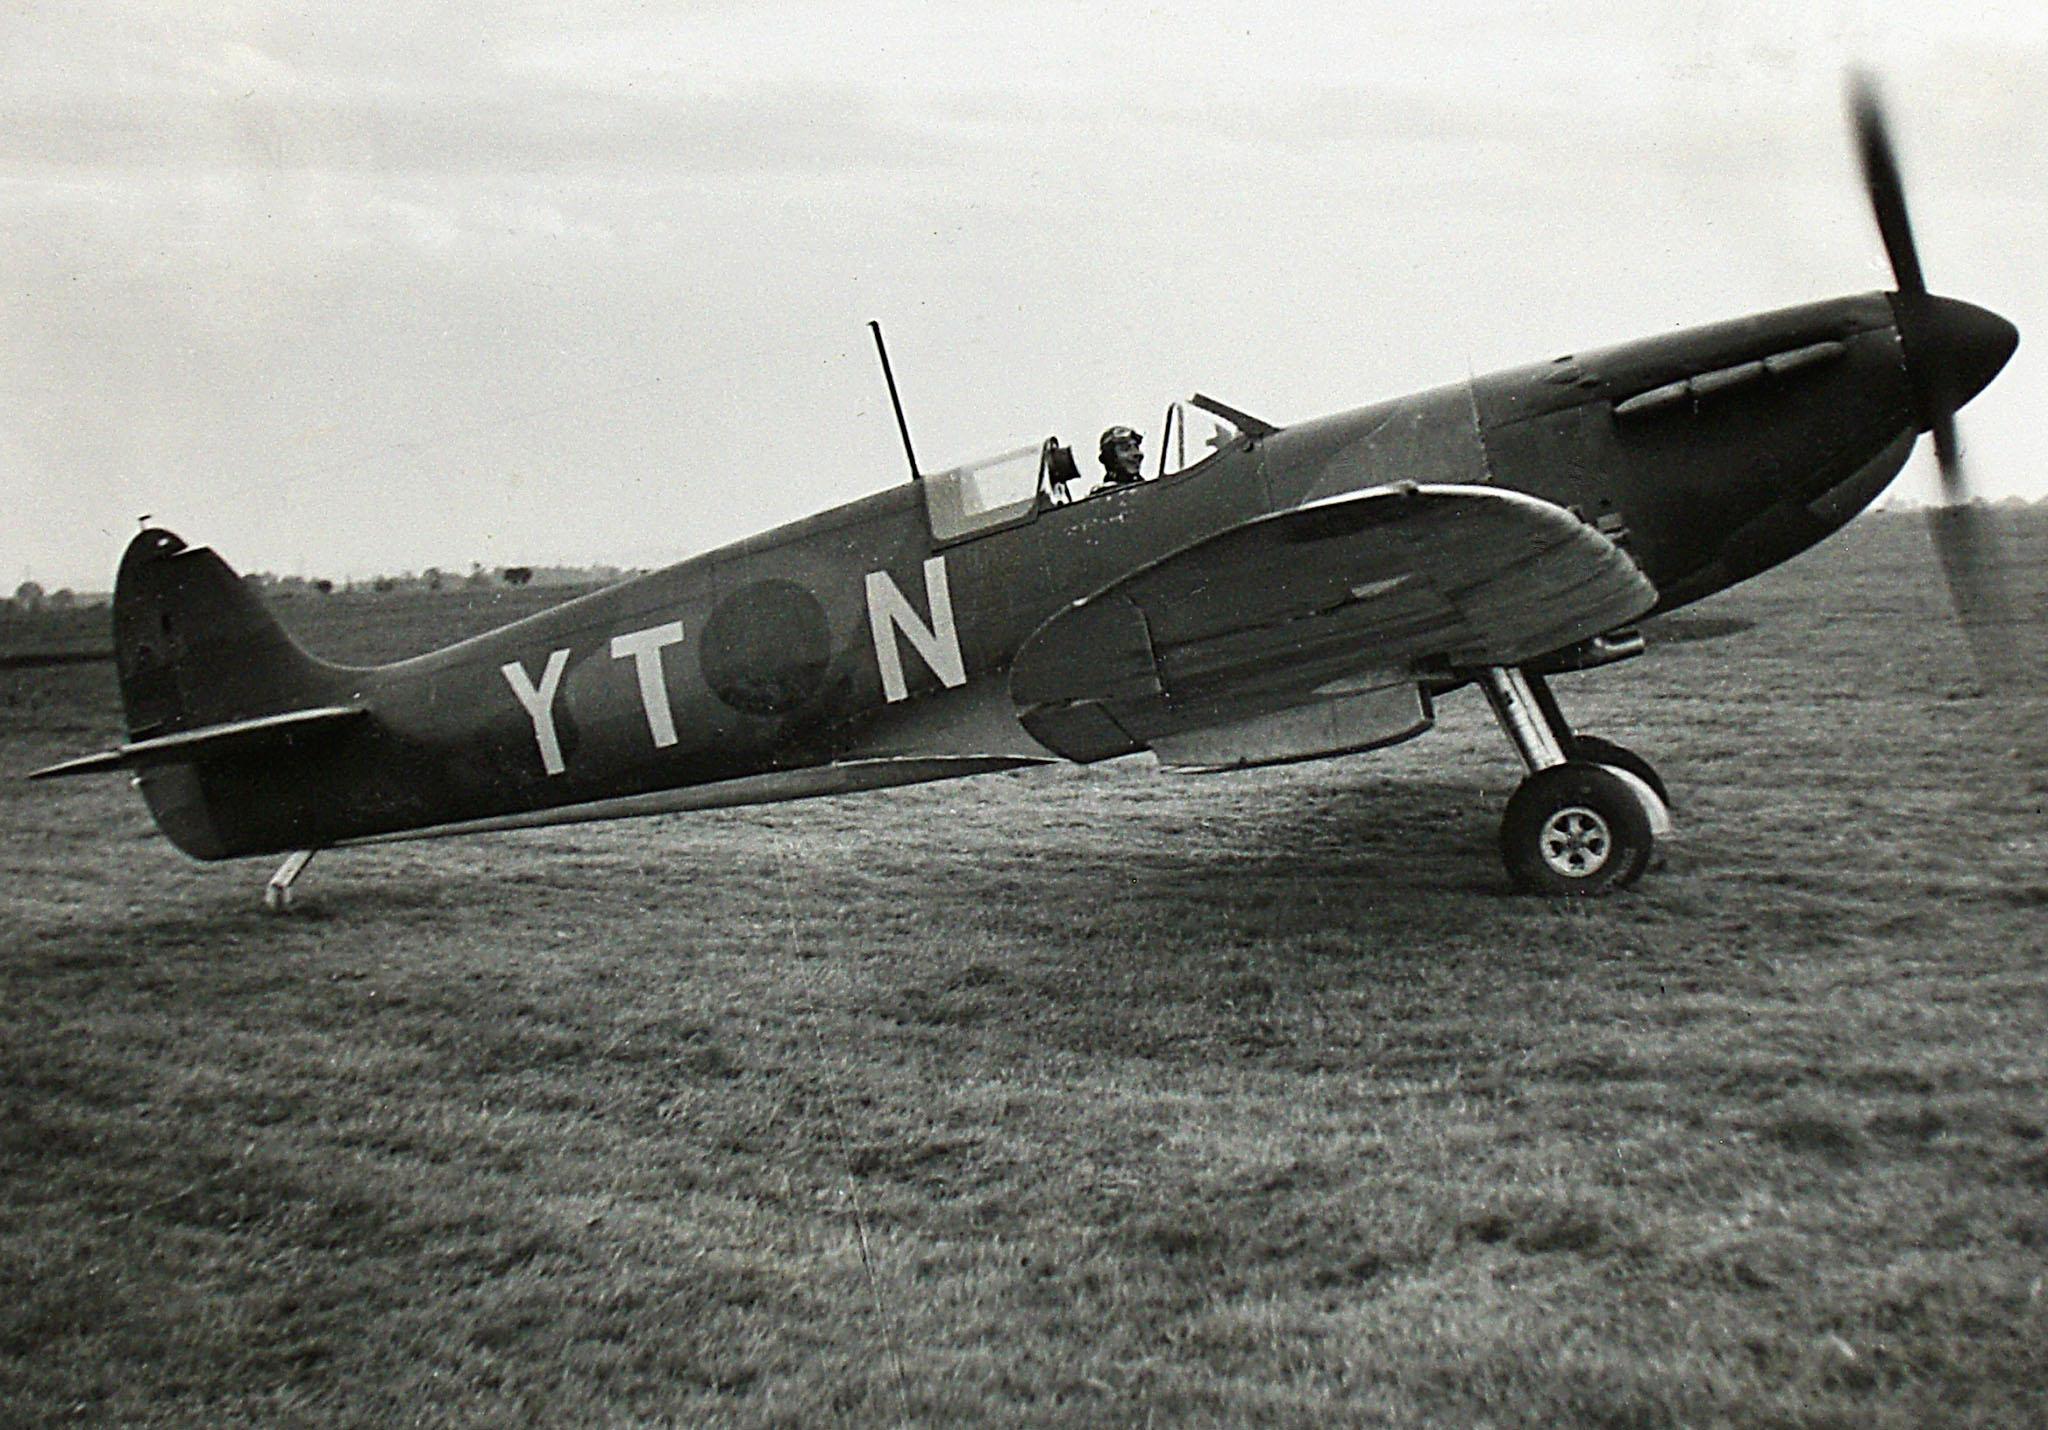 Spitfire MkIa RAF 65Sqn YTN photo taken by Patrick Hayes KIA July 7 1940 01